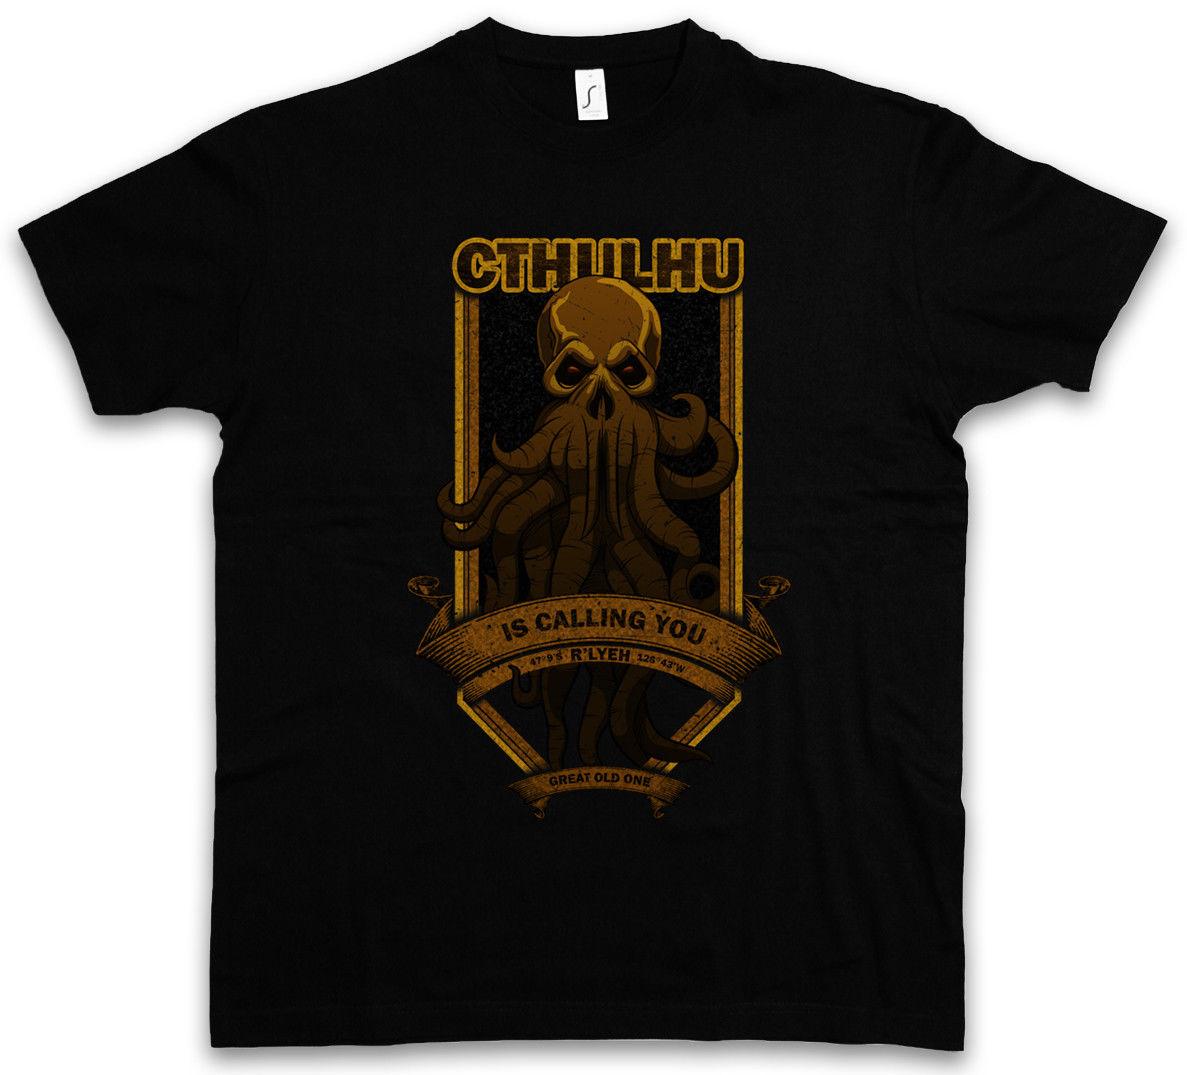 2018 mens fashion T-Shirt CTHULHU IS CALLING YOU - Wars Horror Arkham H. P. Lovecraft Miskatonic S - 5XL